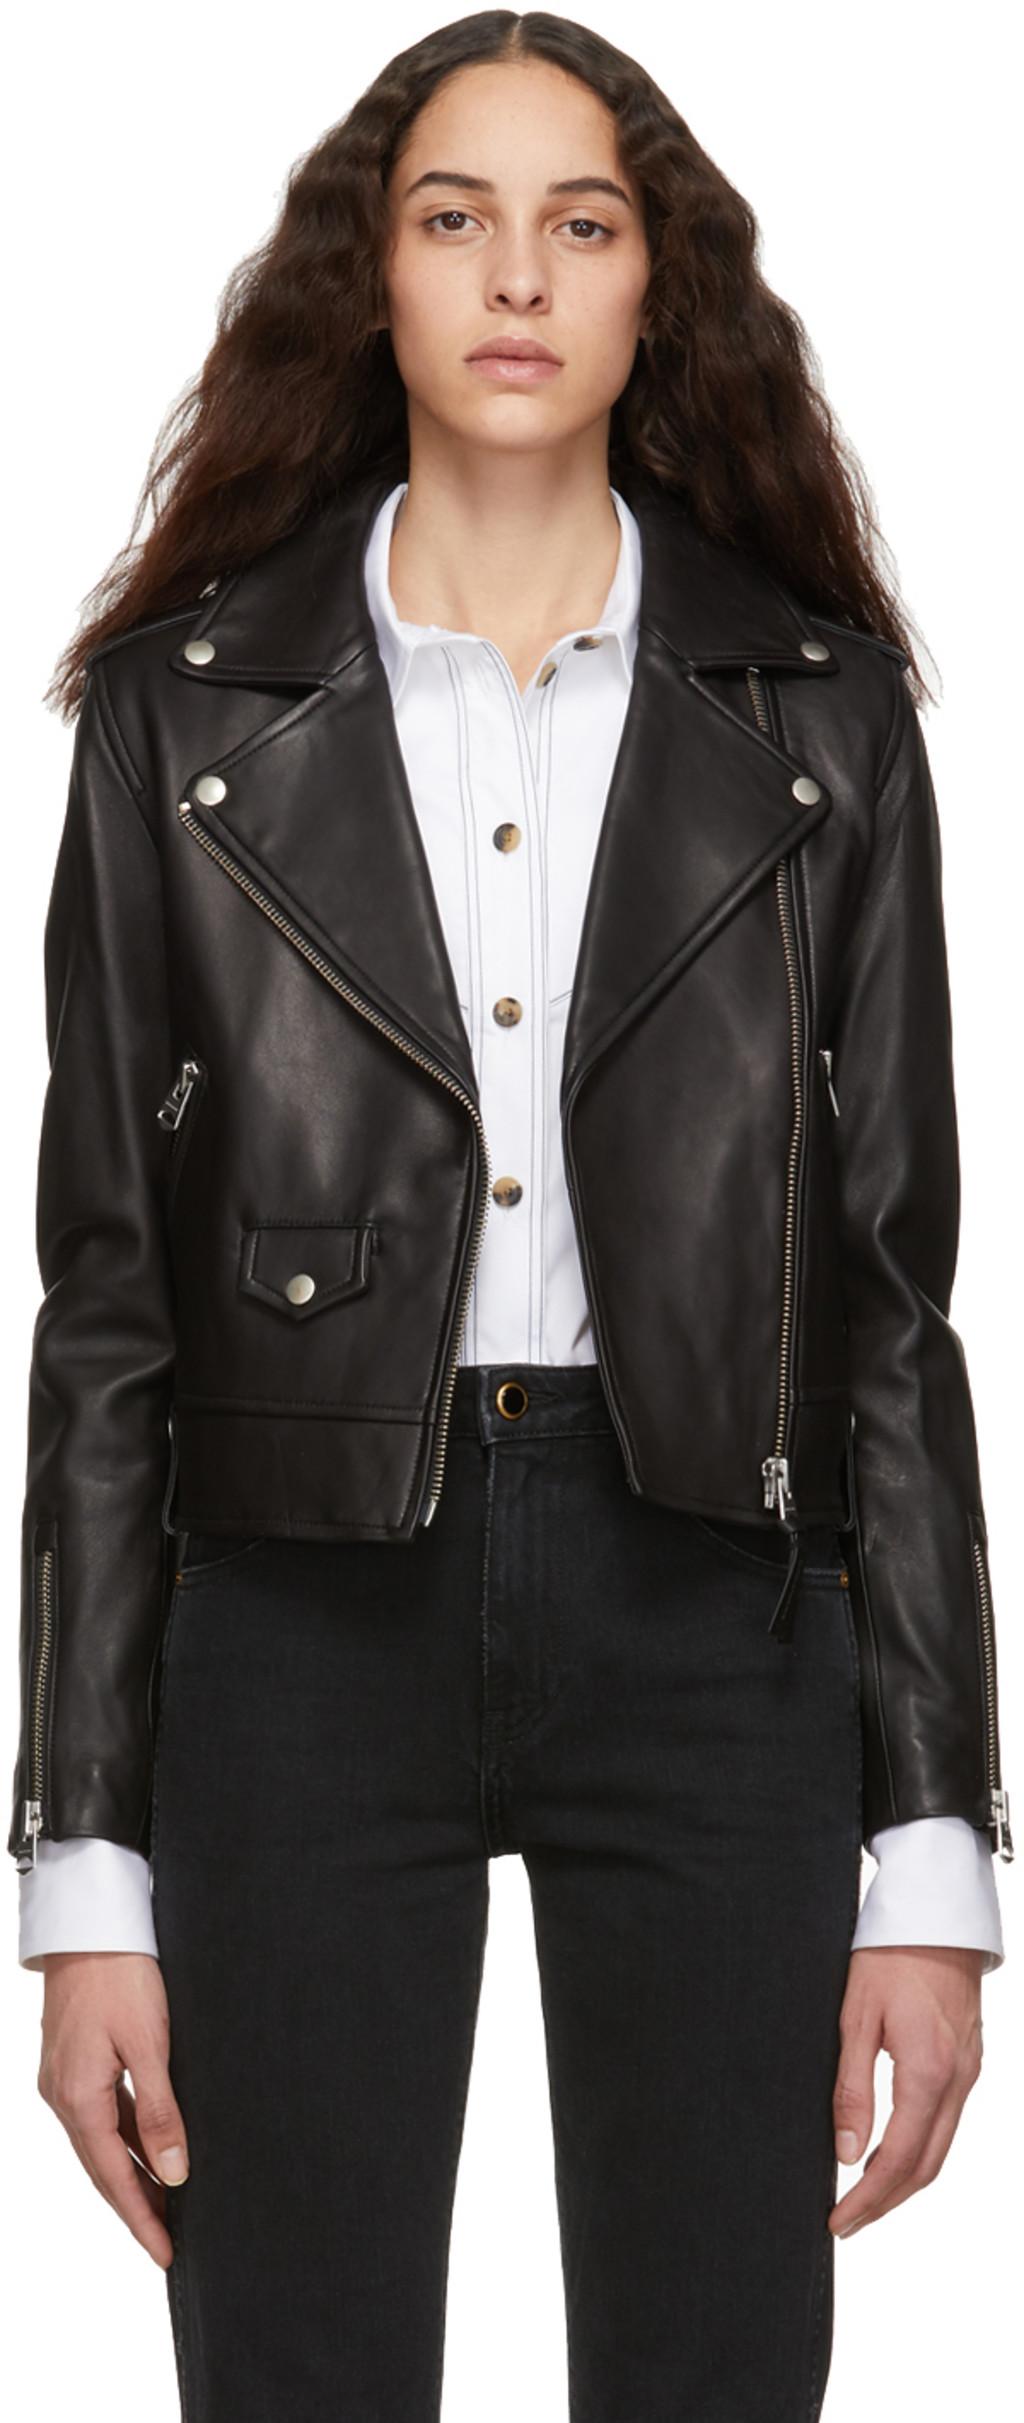 Designer Leather Jackets For Women Ssense Canada